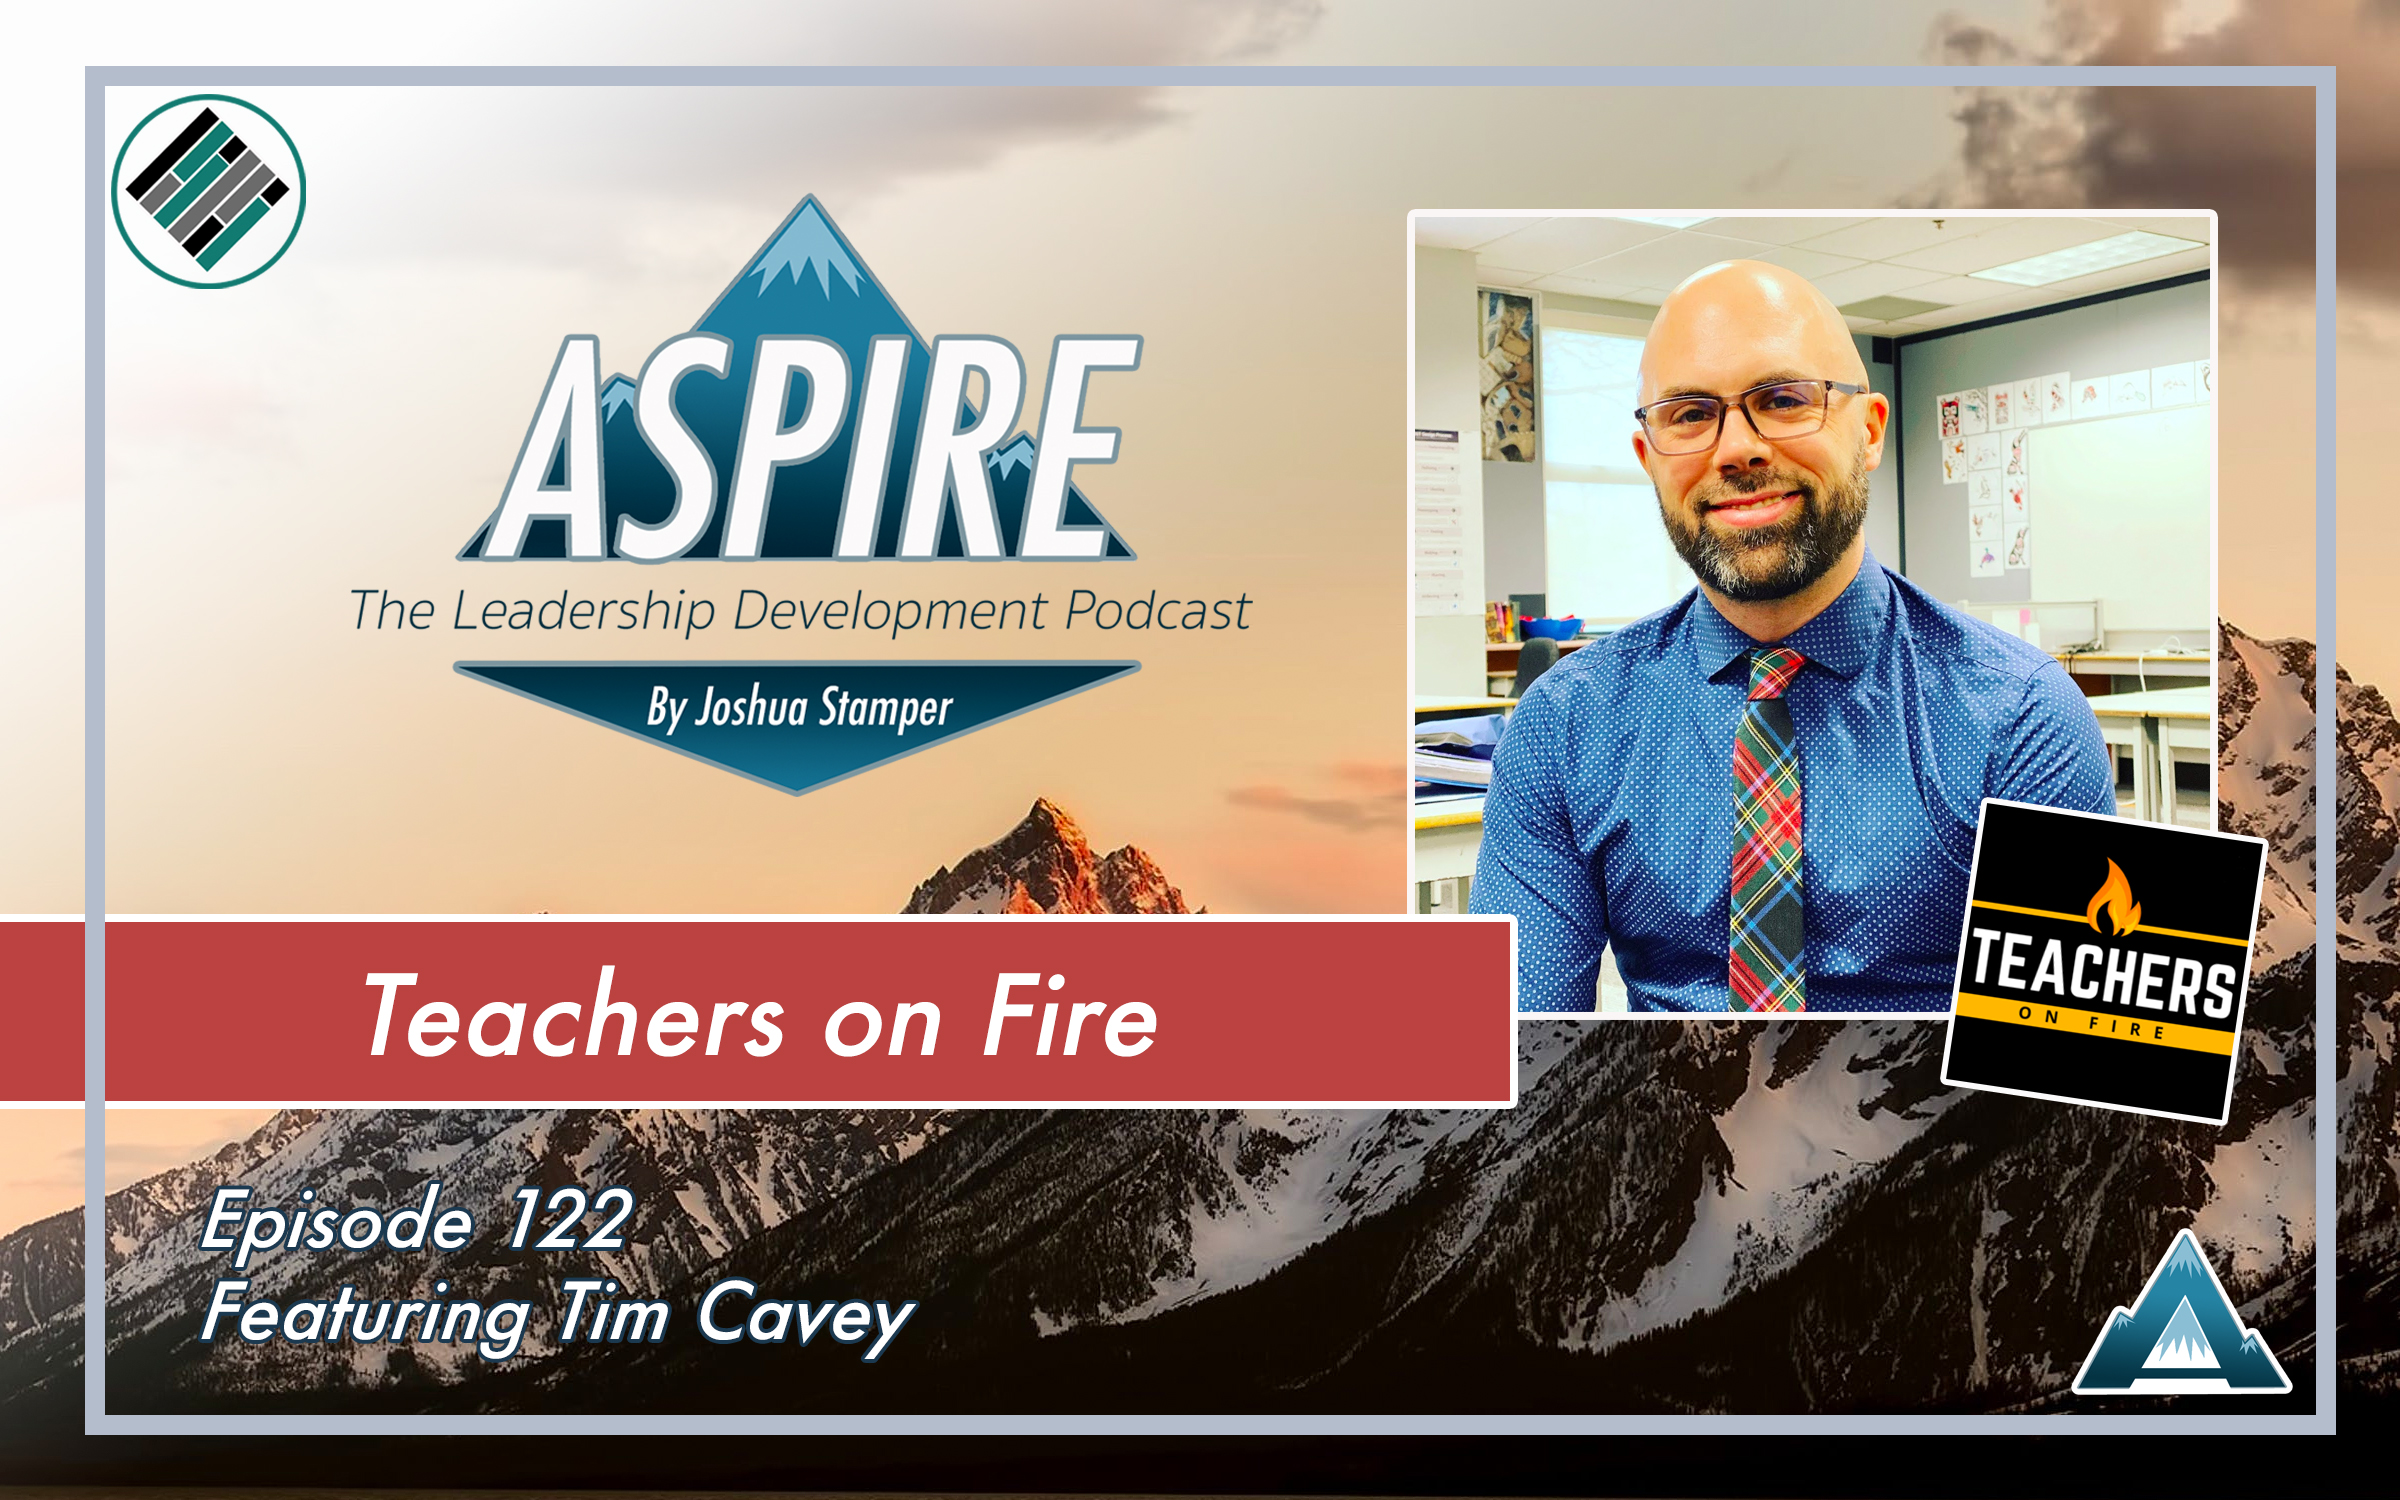 Teachers on Fire, Tim Cavey, Aspire: The Leadership Development Podcast, #AspireLead